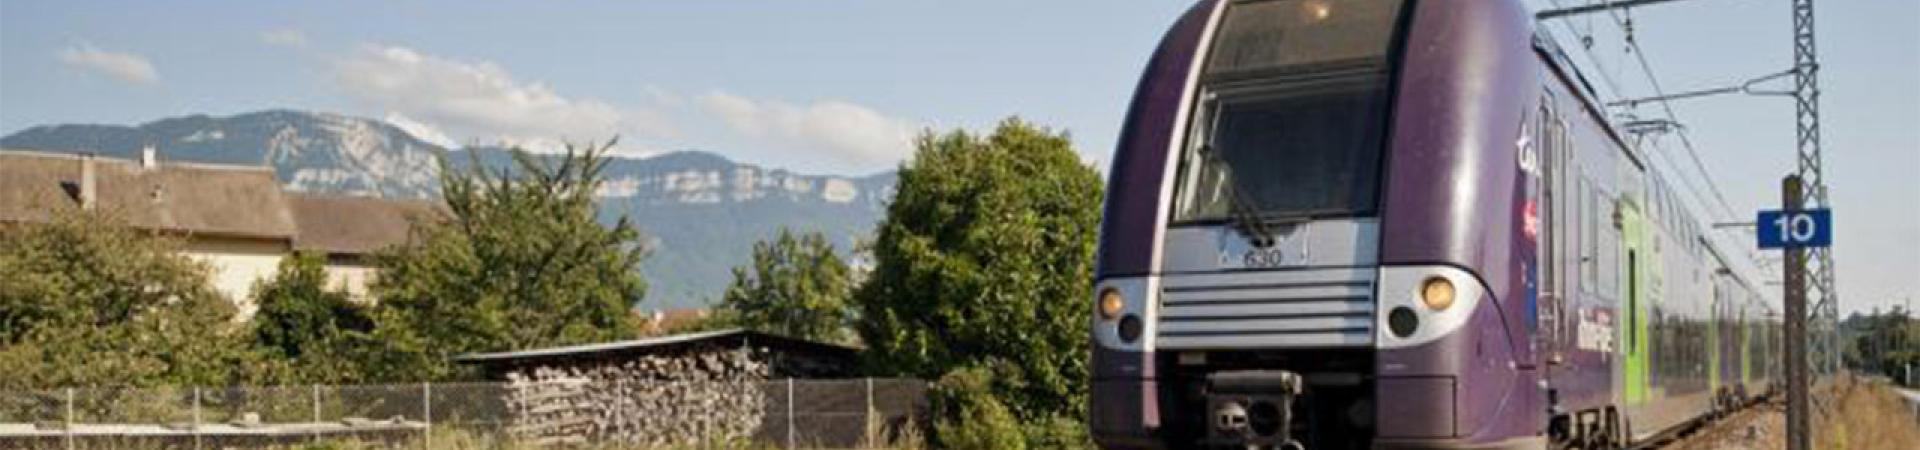 Projet ferroviaire d'accès alpins Lyon-Chambéry-Turin